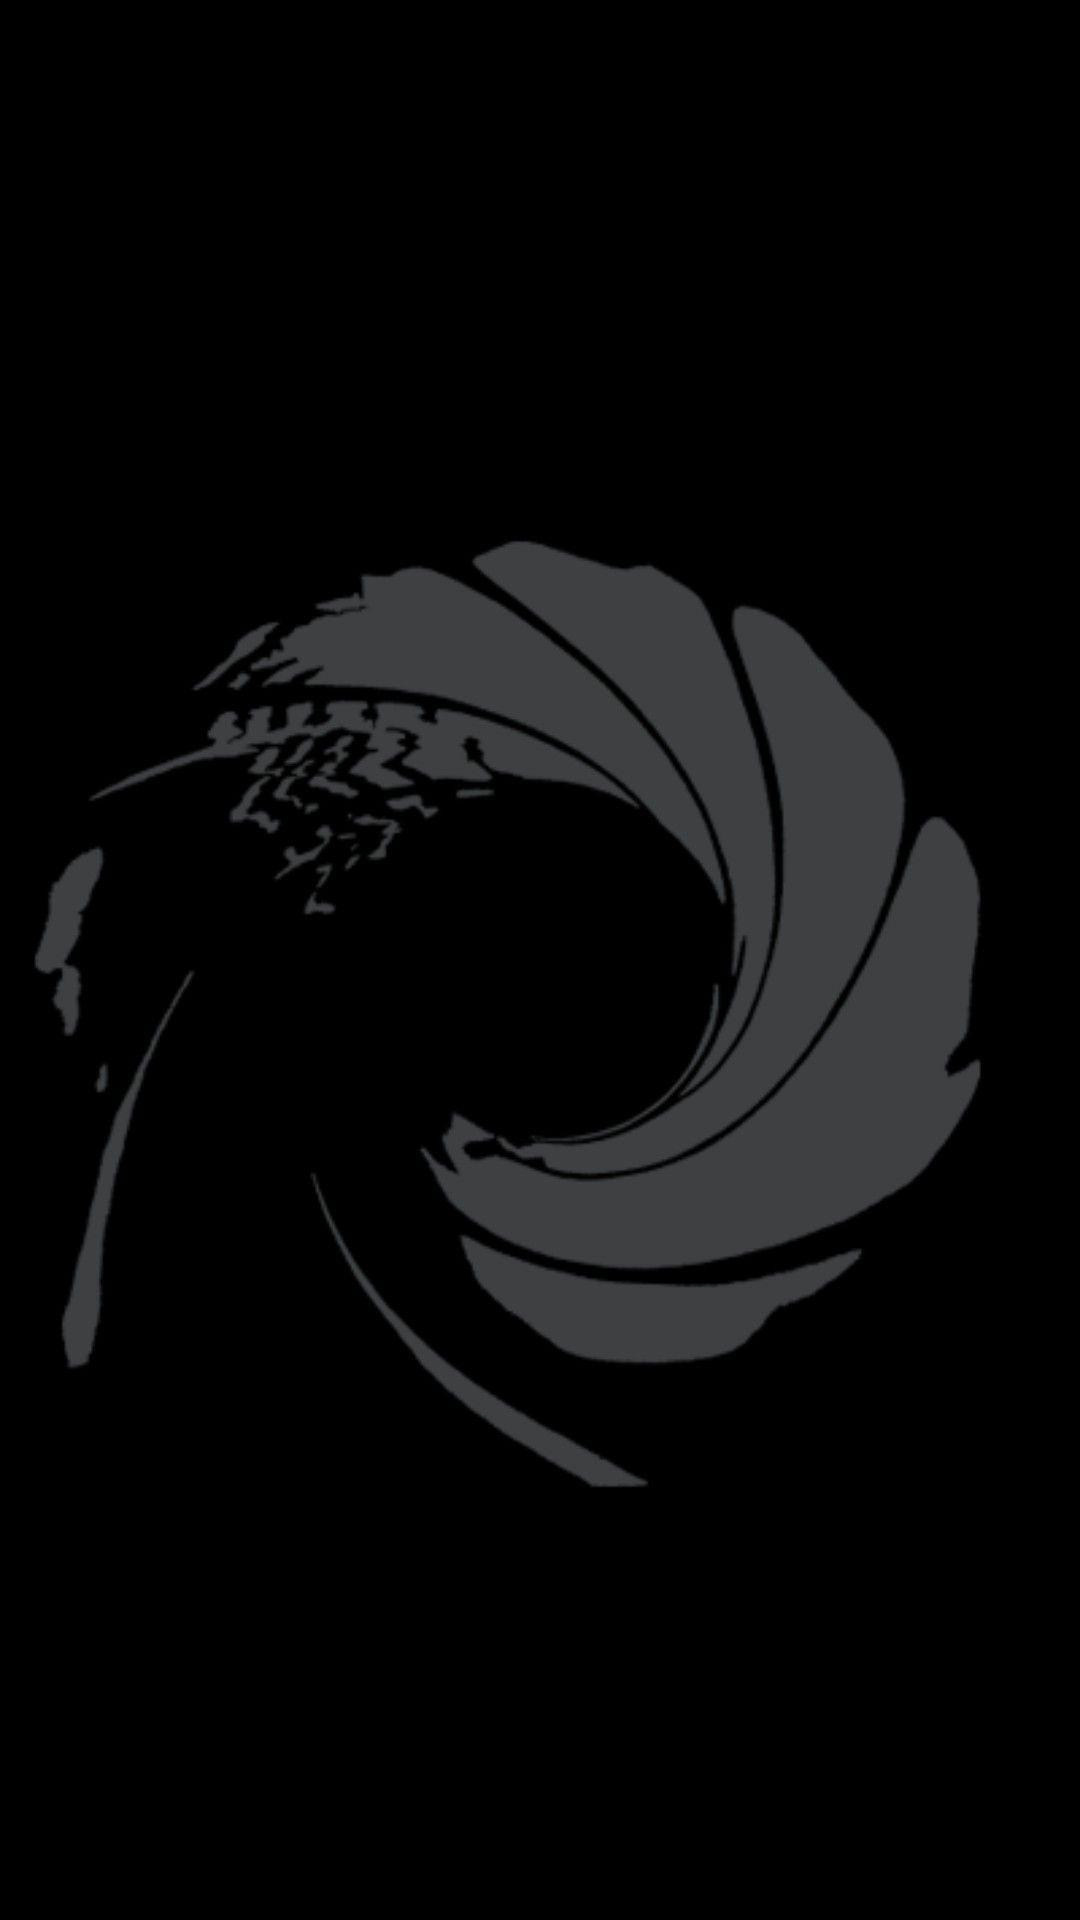 Pin By Darkside Creative Now Showin On 007 Bond Movies Spiritual Movies James Bond